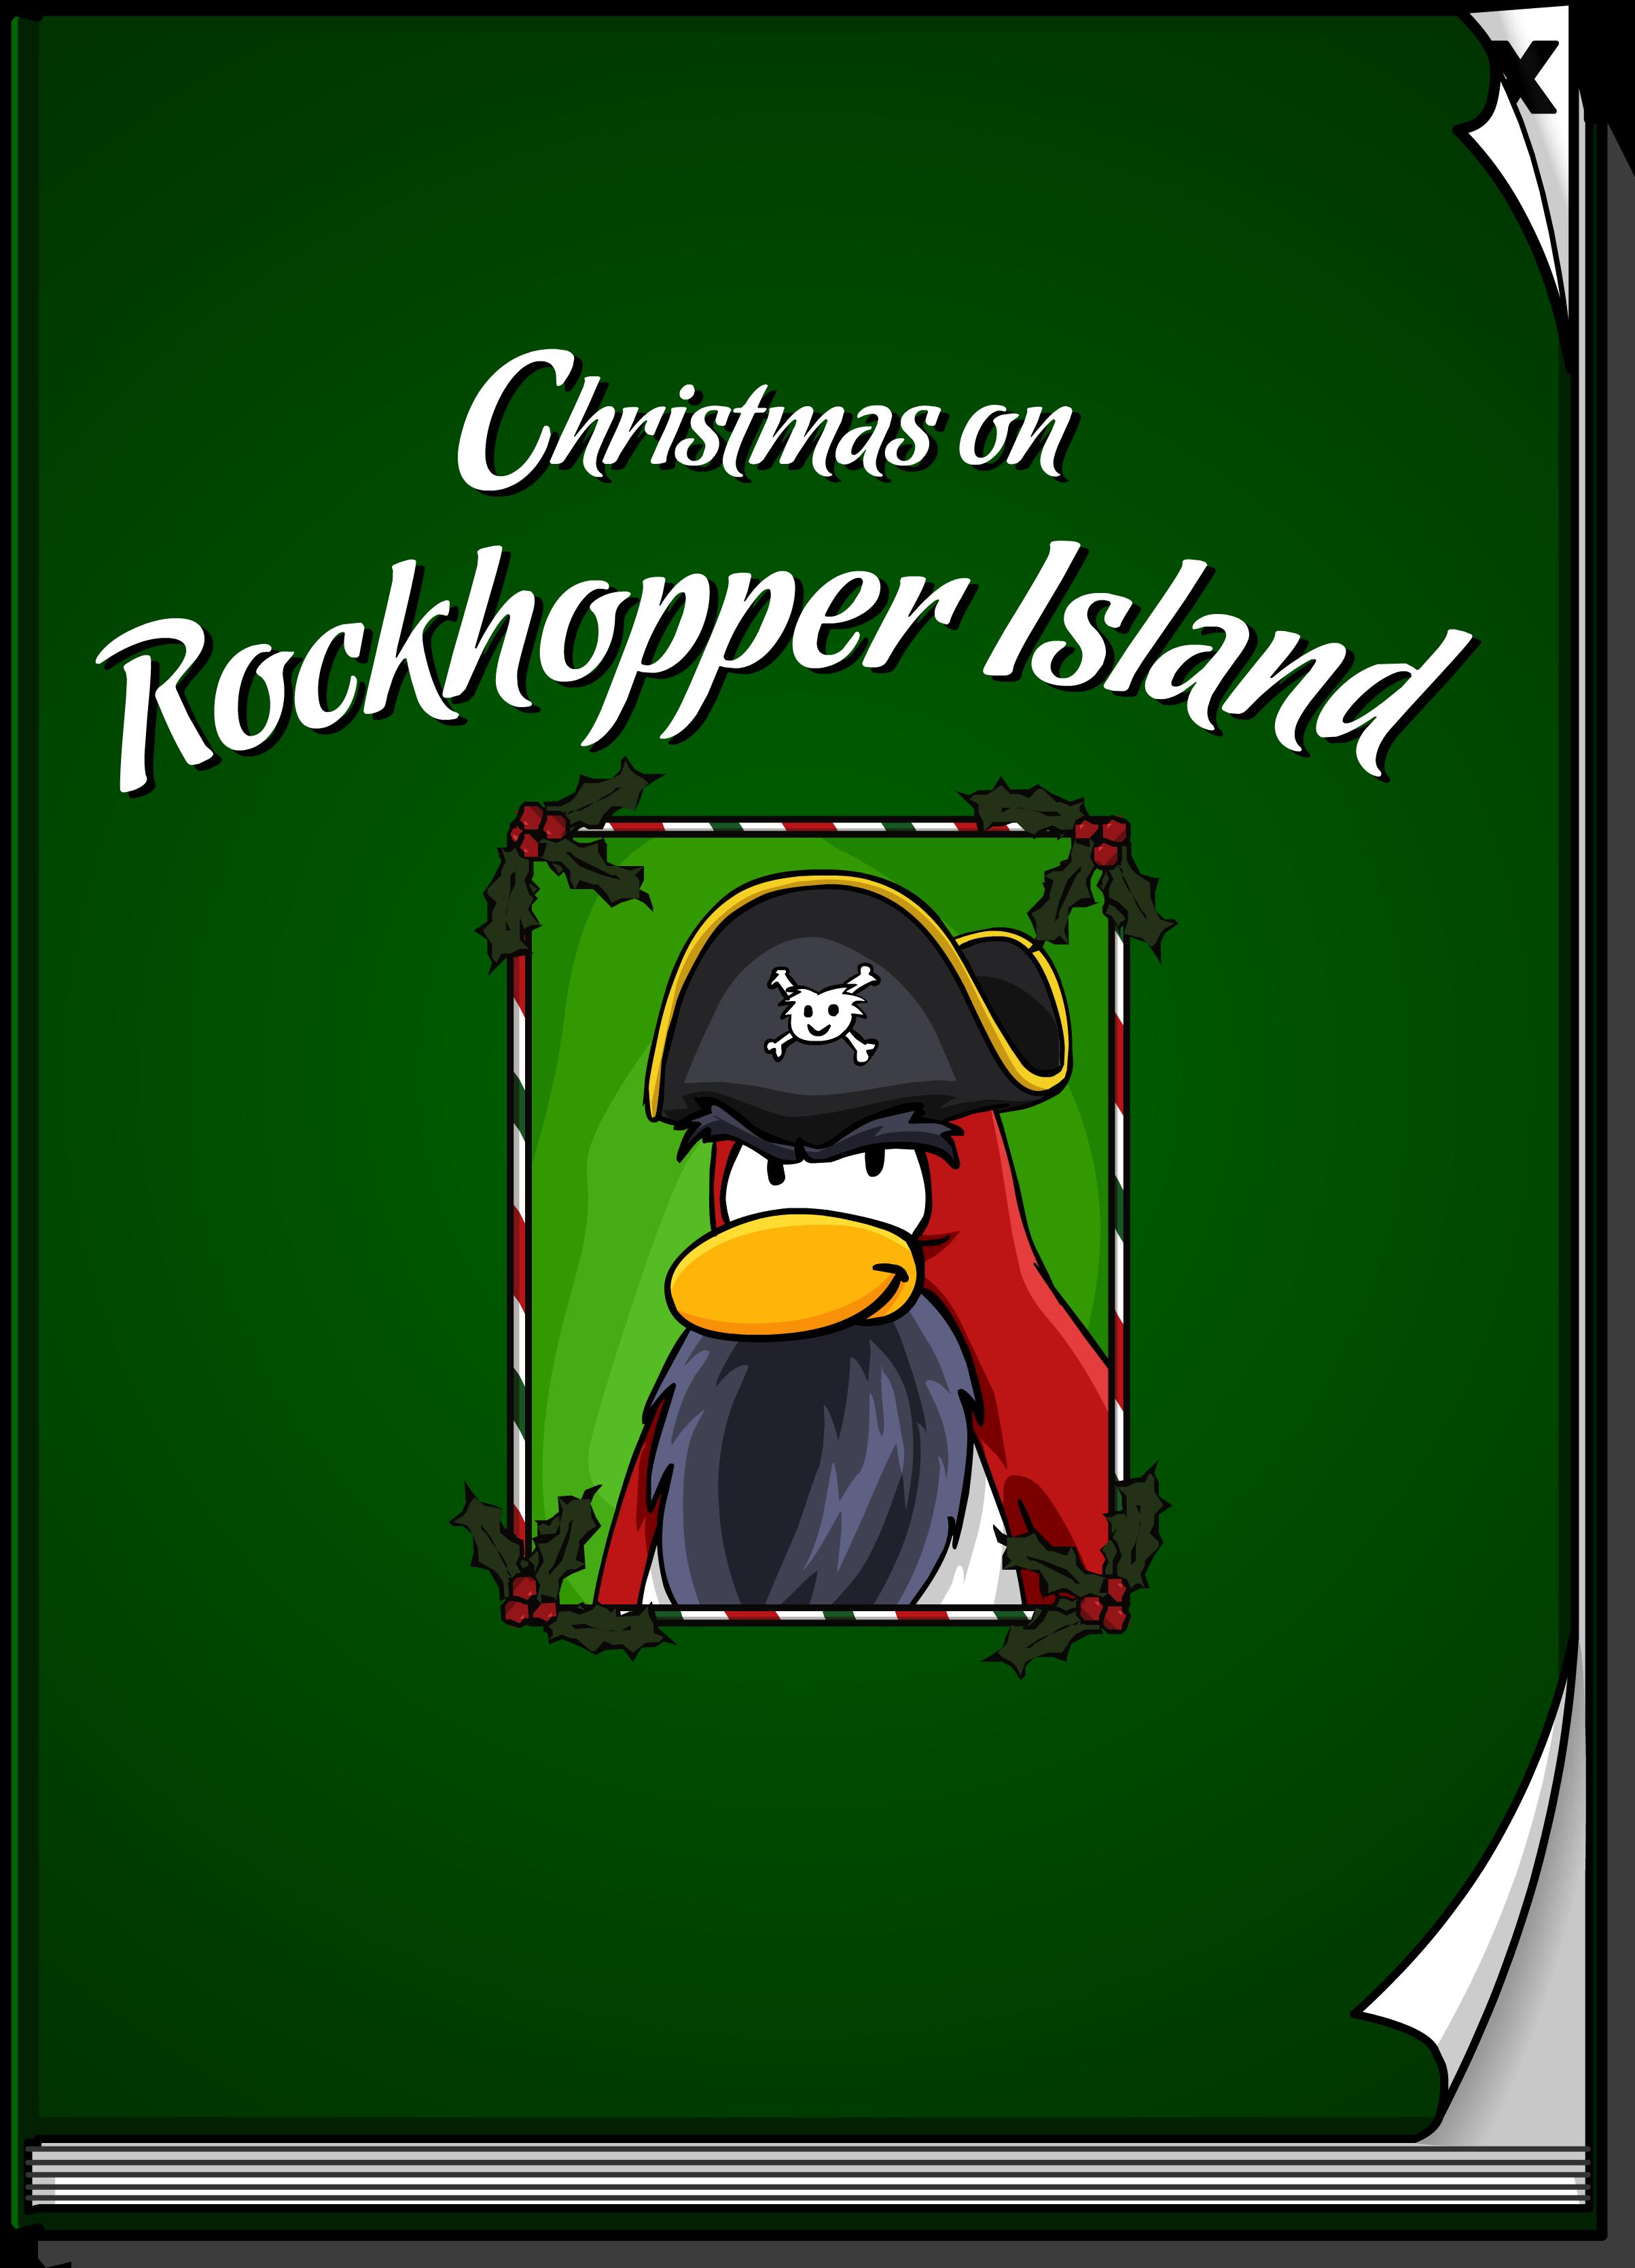 Christmas on Rockhopper Island